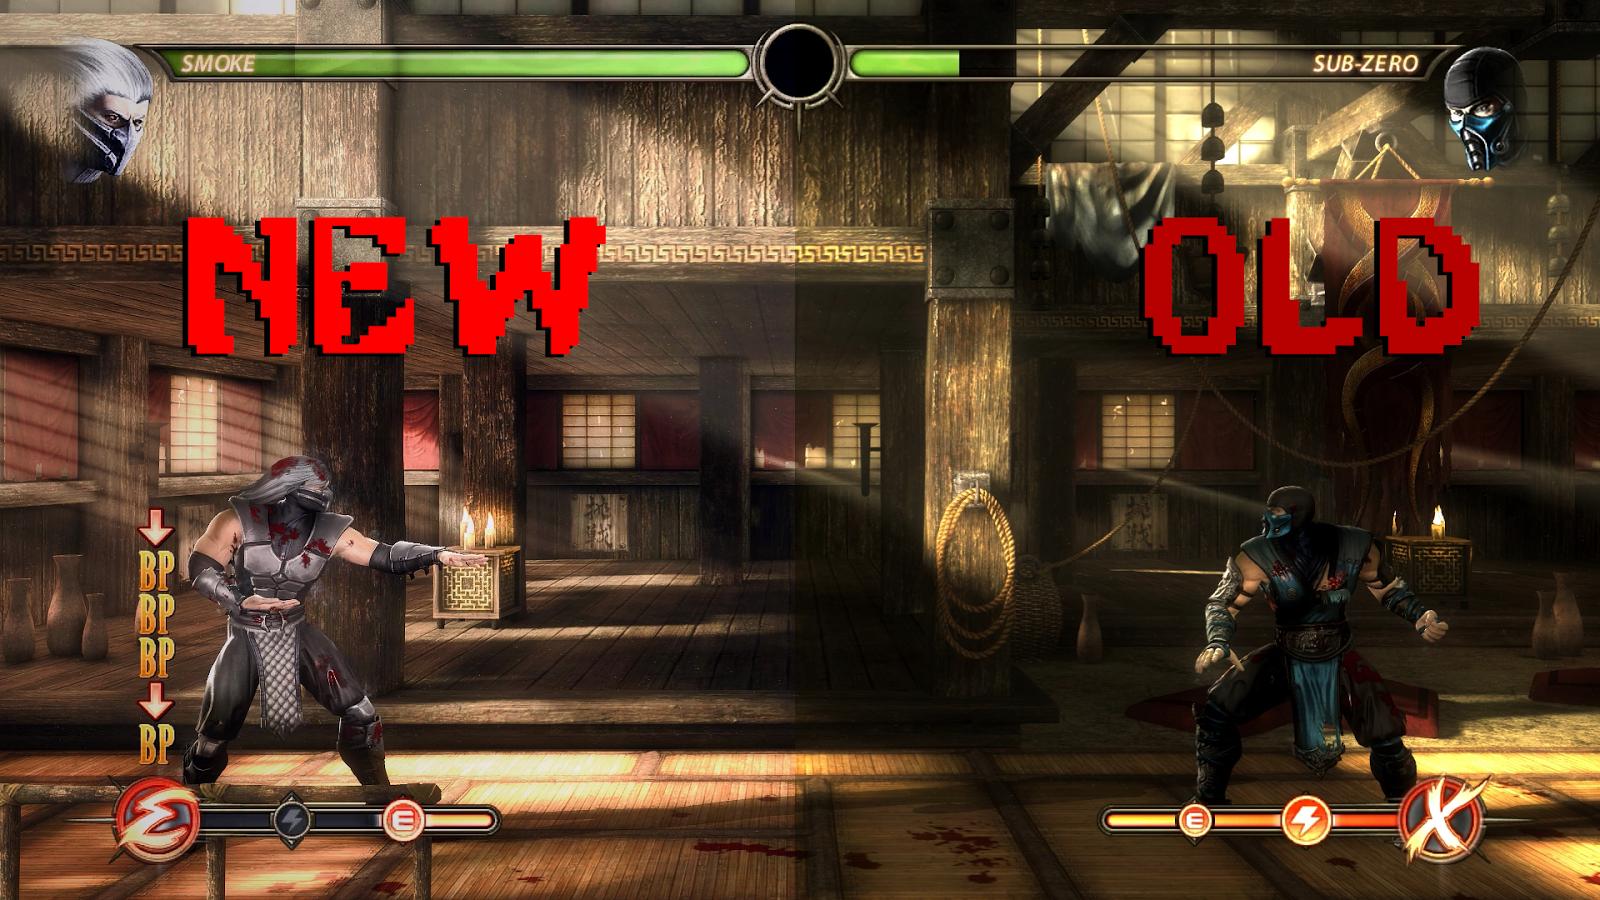 Mortal Kombat 9 Komplete Edition Lightning Graphics Mod